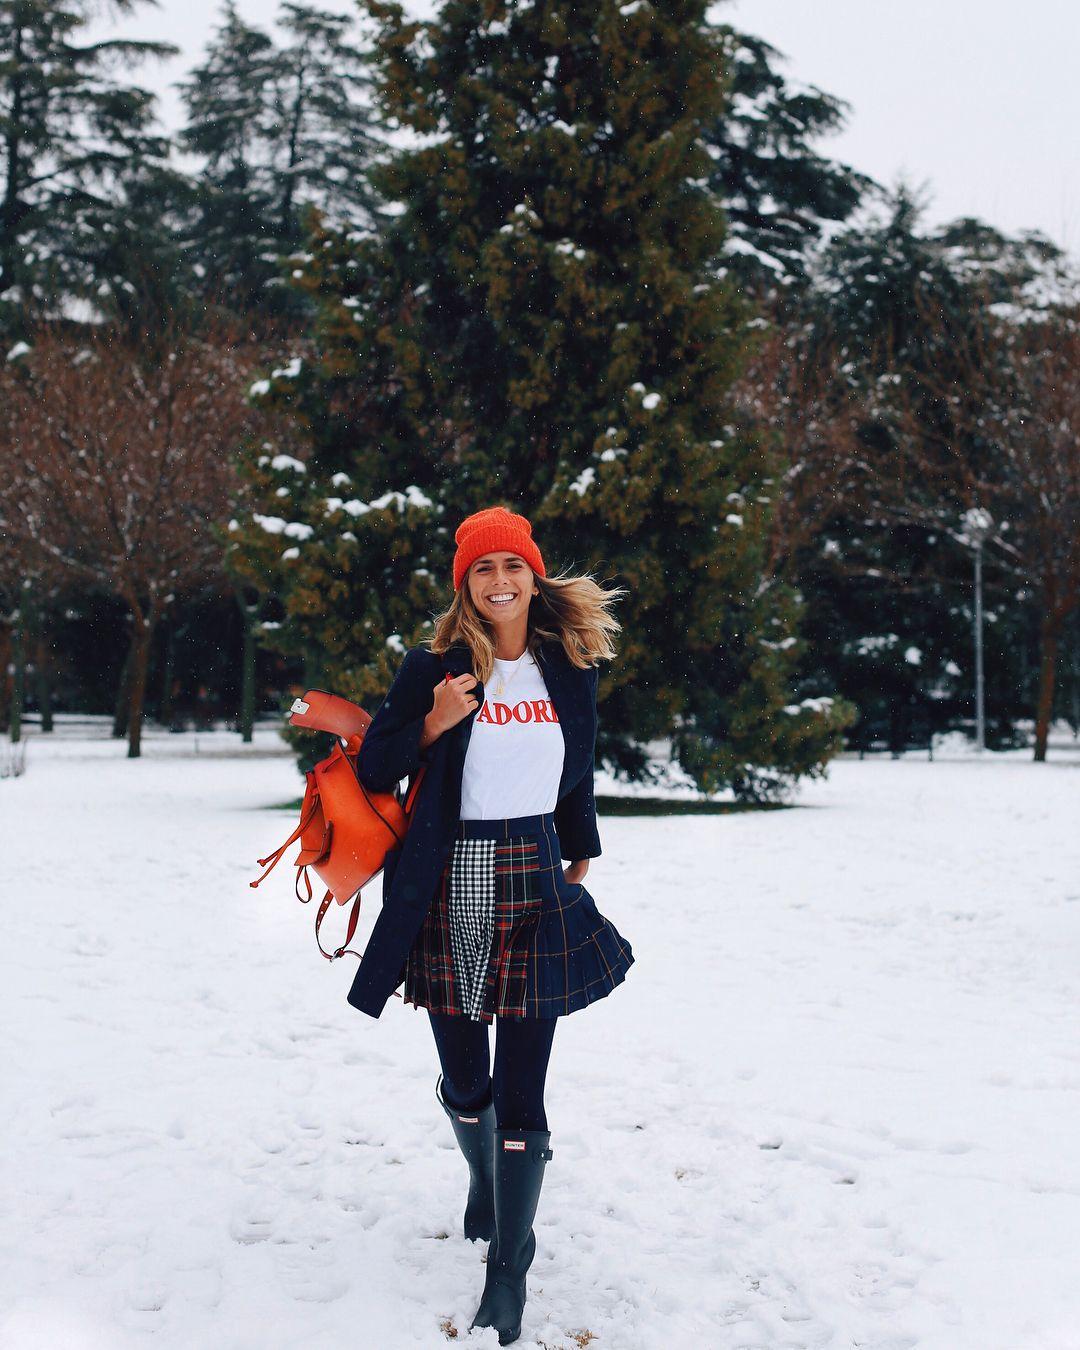 203.5k Followers, 554 Following, 672 Posts - See Instagram photos and videos from Lucía Bárcena (@luciabarcena)